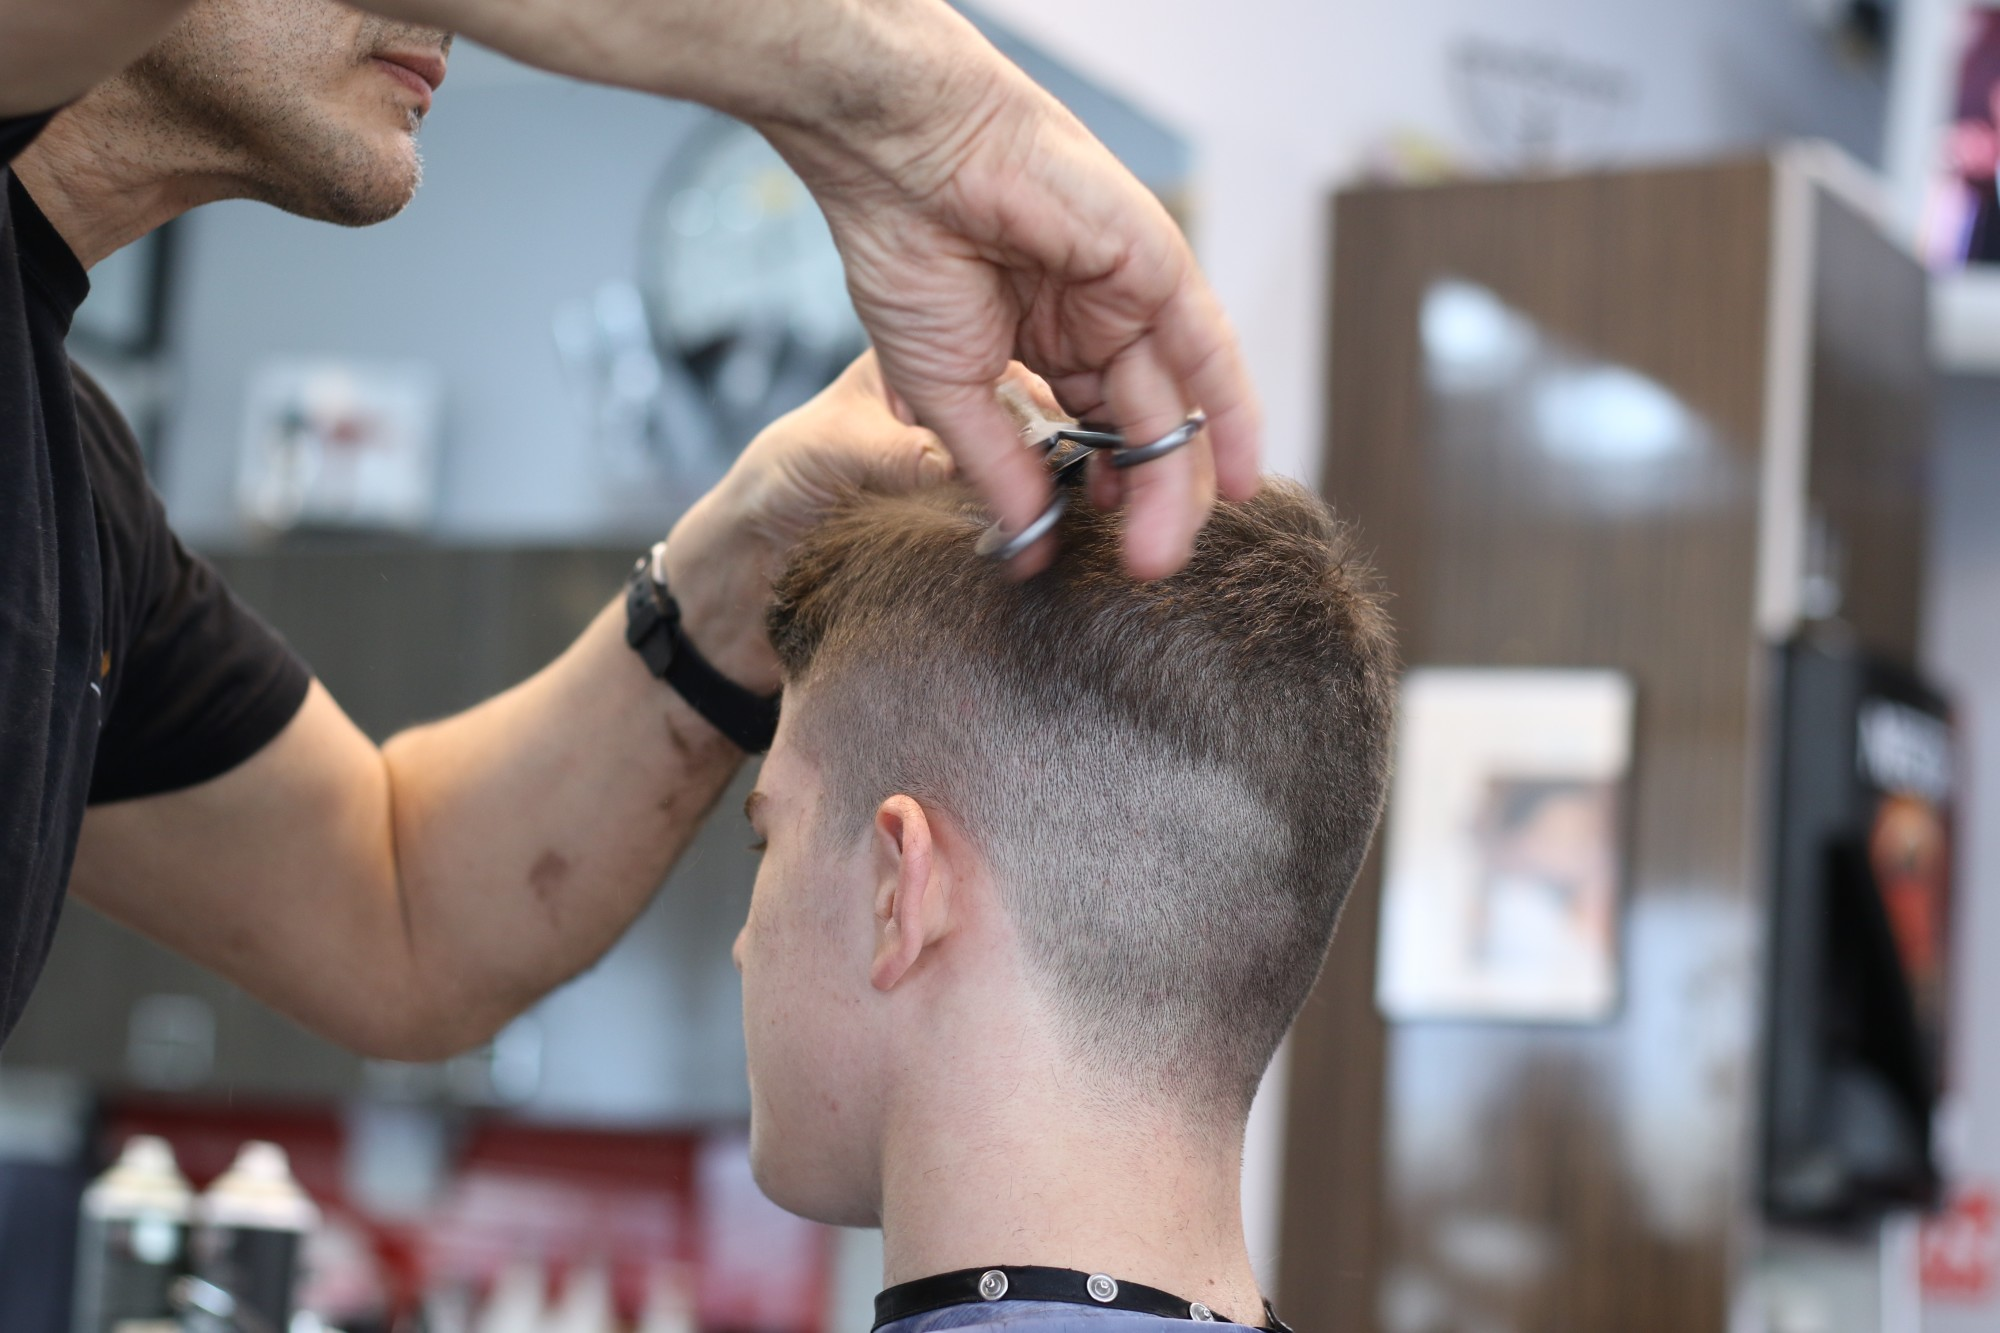 Person Getting a Masculine Haircut